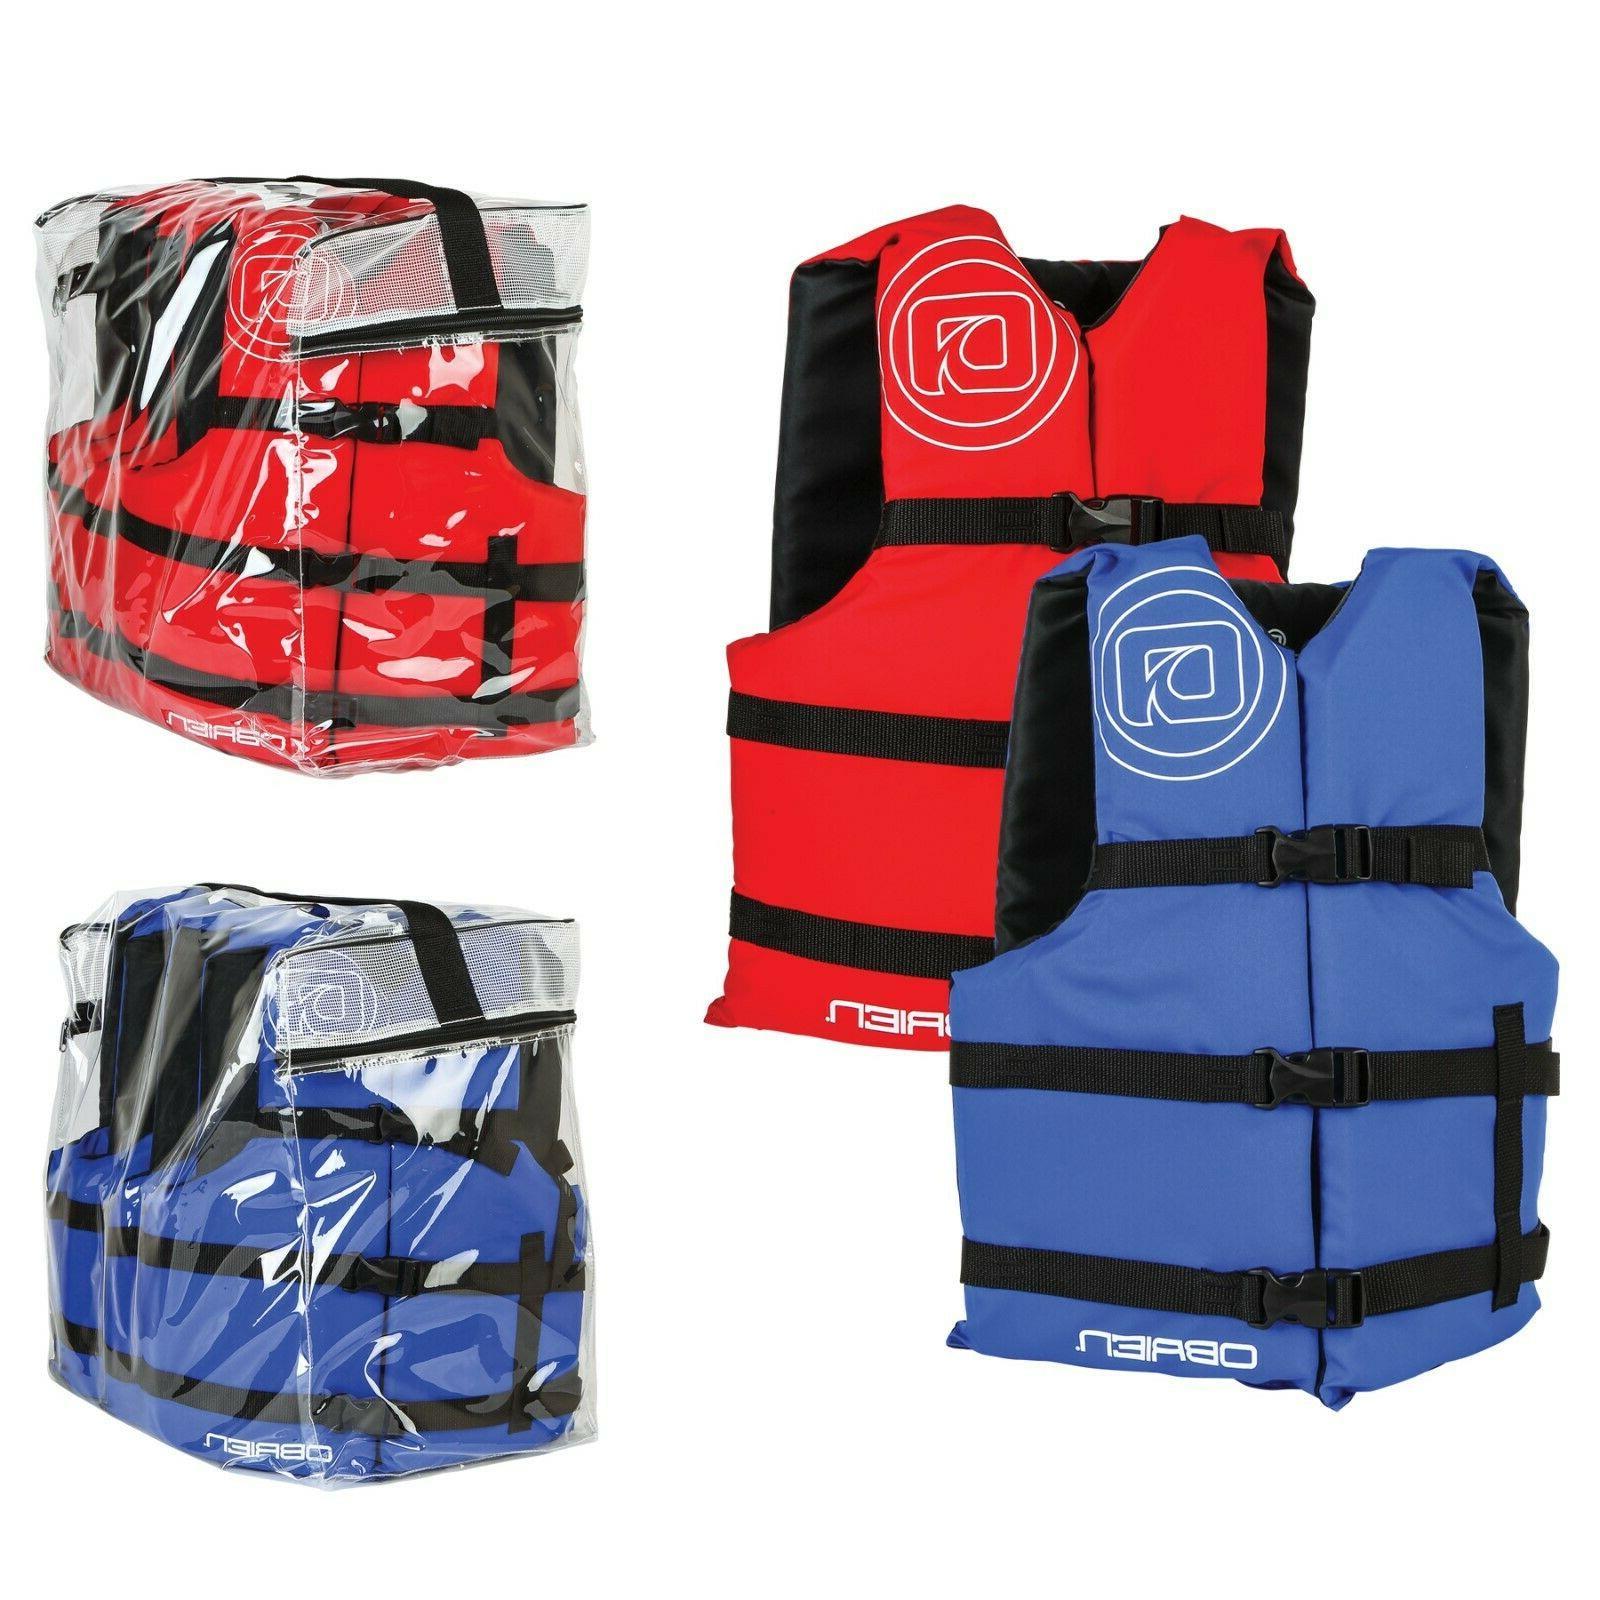 new o brien universal life jacket 4